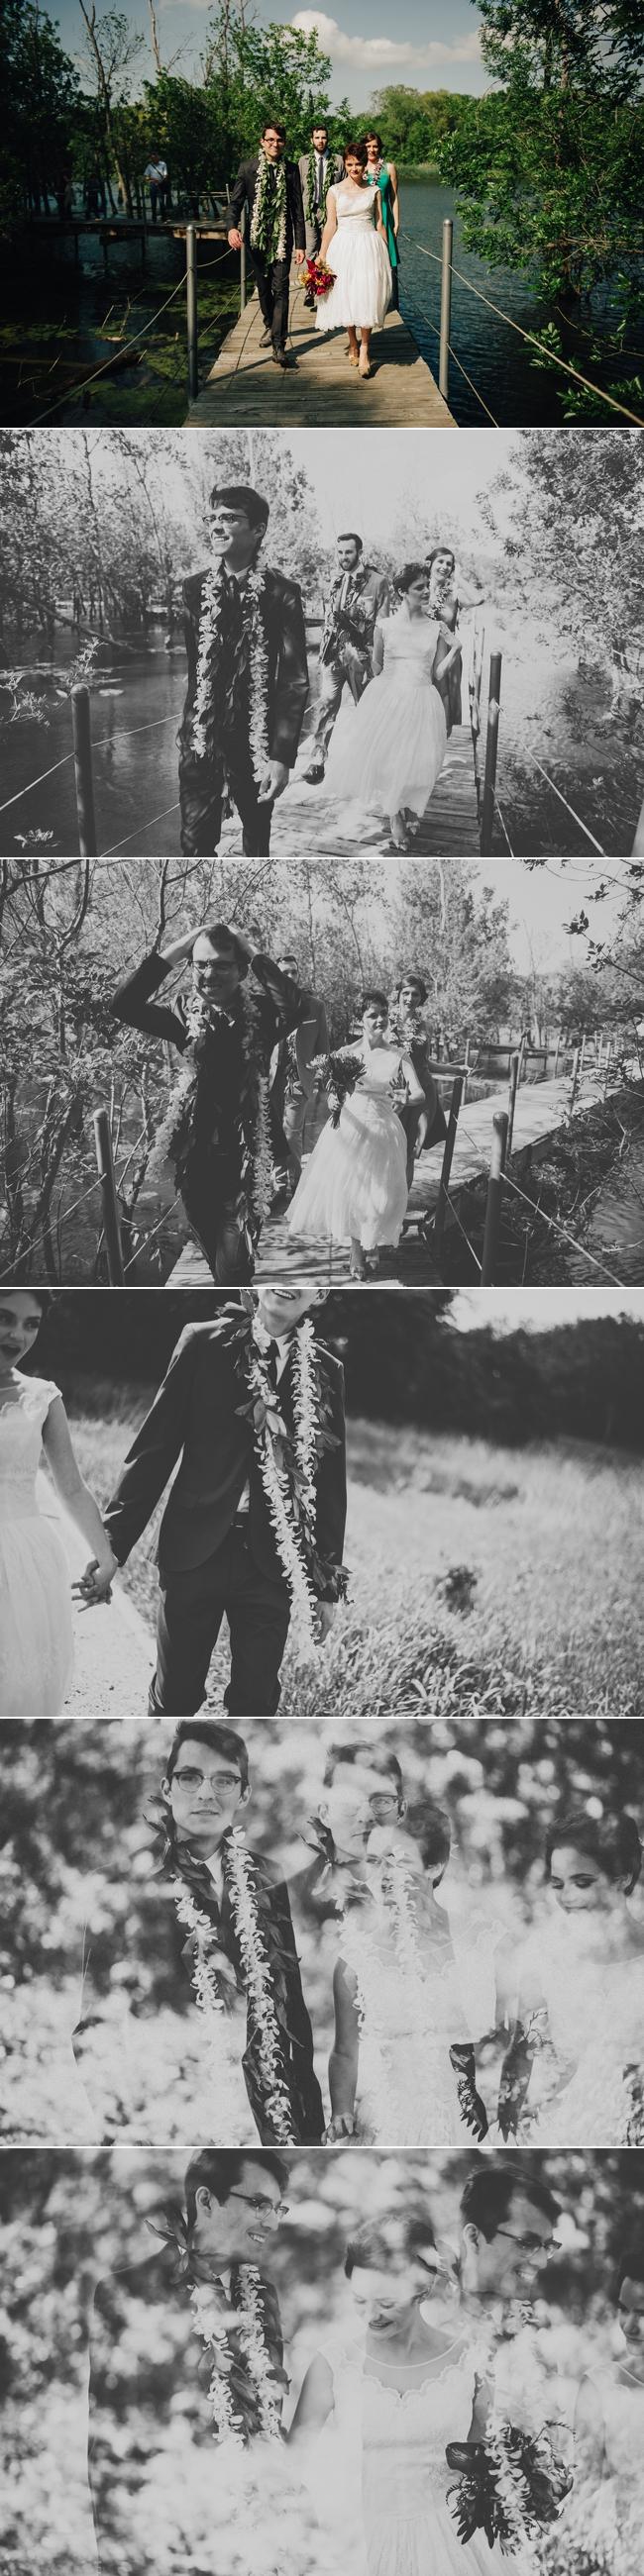 Wedding Photographers Denver Co